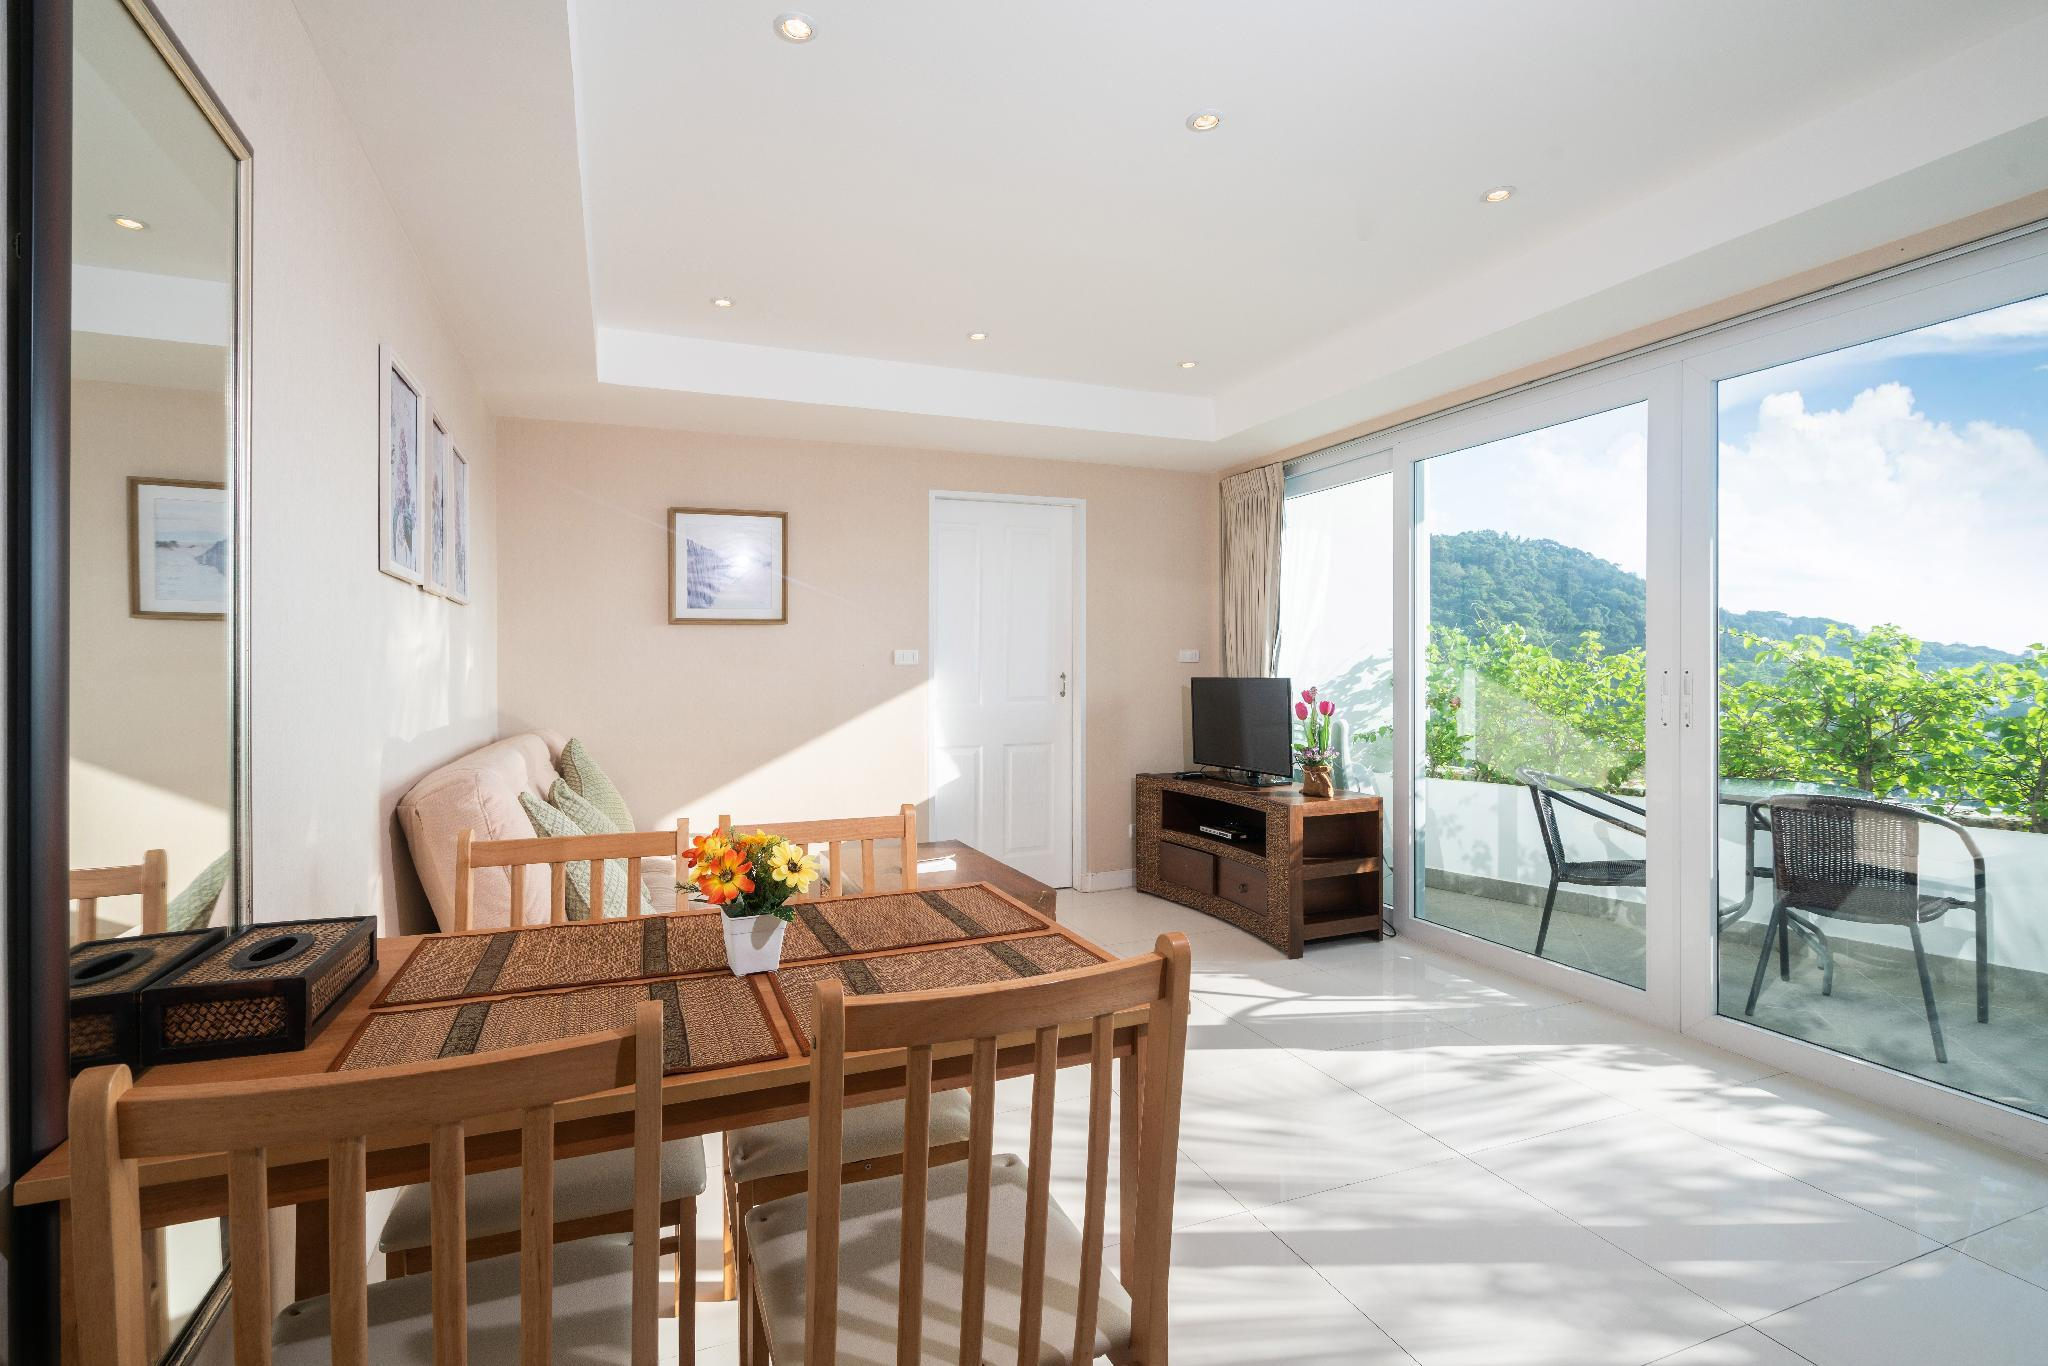 1 BDR Apartment Ocean View from Bedroom in Kata อพาร์ตเมนต์ 1 ห้องนอน 1 ห้องน้ำส่วนตัว ขนาด 53 ตร.ม. – กะรน